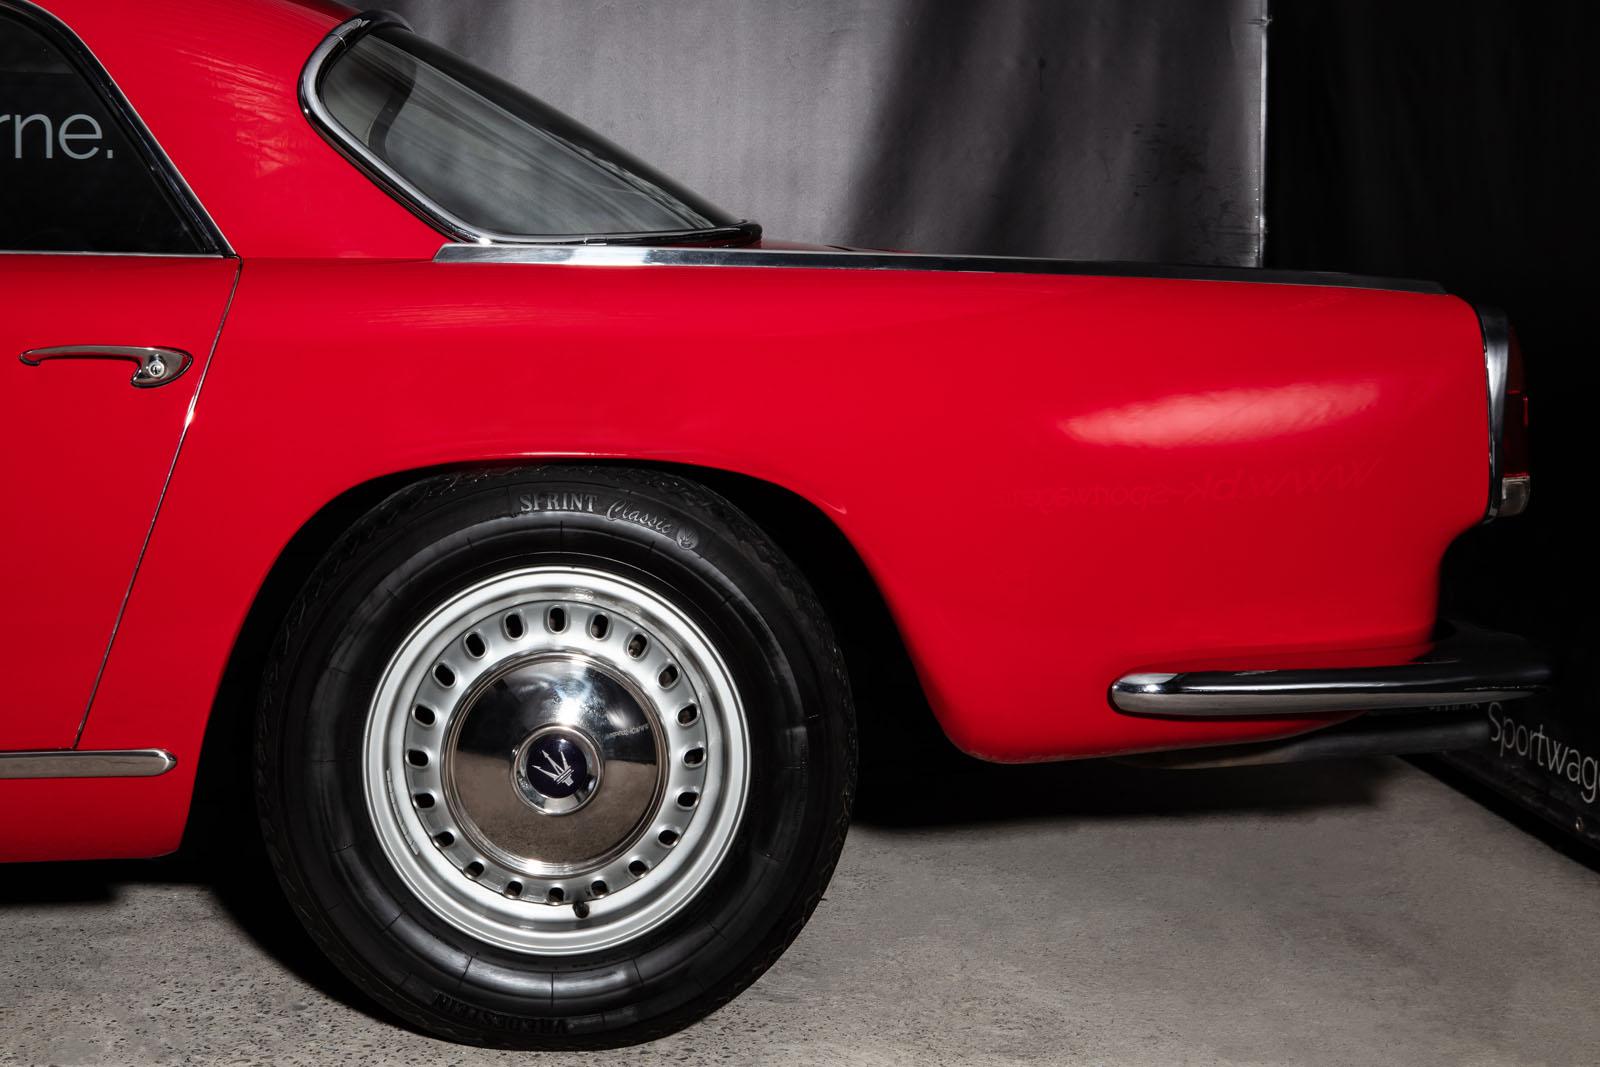 Maserati_3500_GT_Rot_Black_MAS-1742_4_w